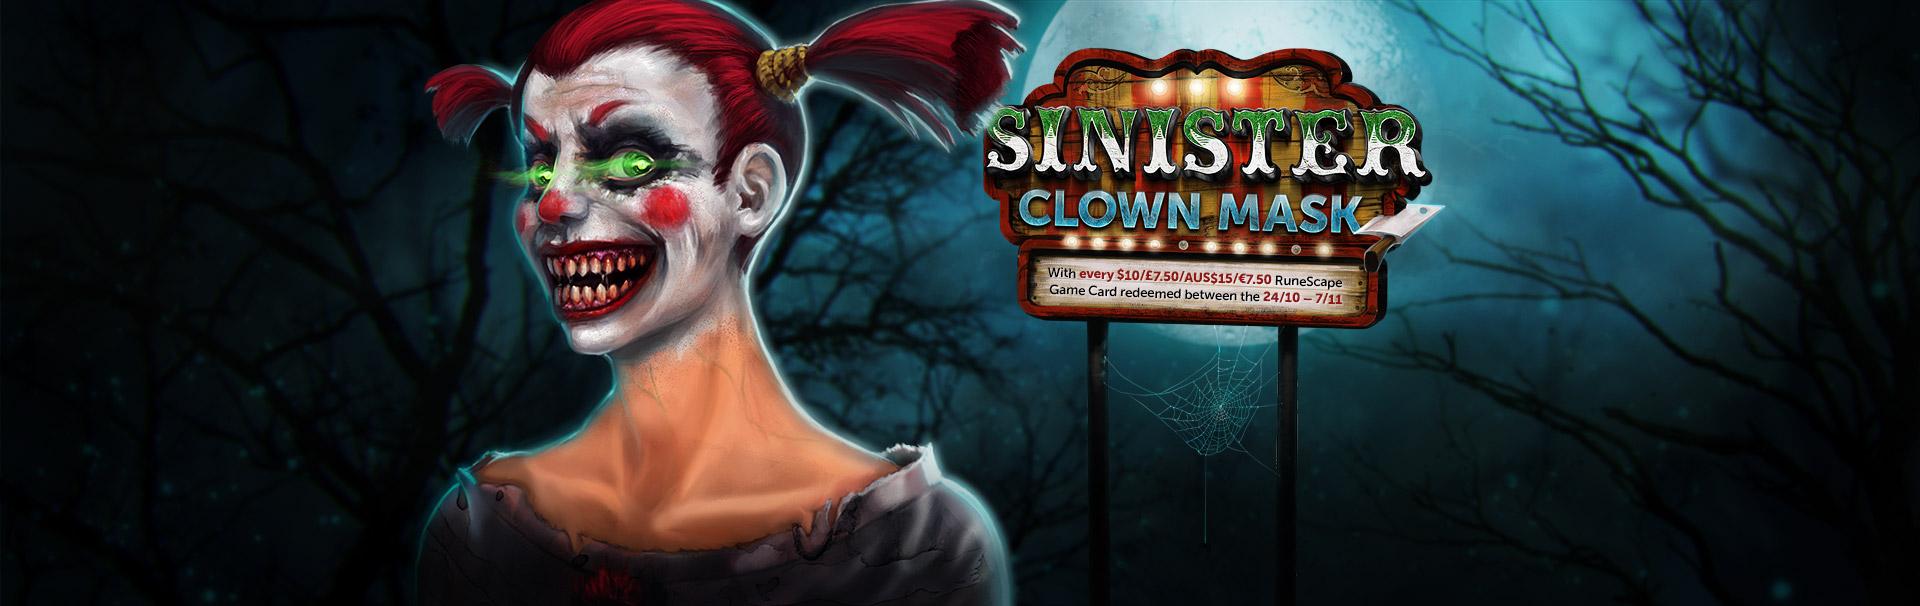 Image - Sinister Clown Mask banner.jpg | RuneScape Wiki | FANDOM ...